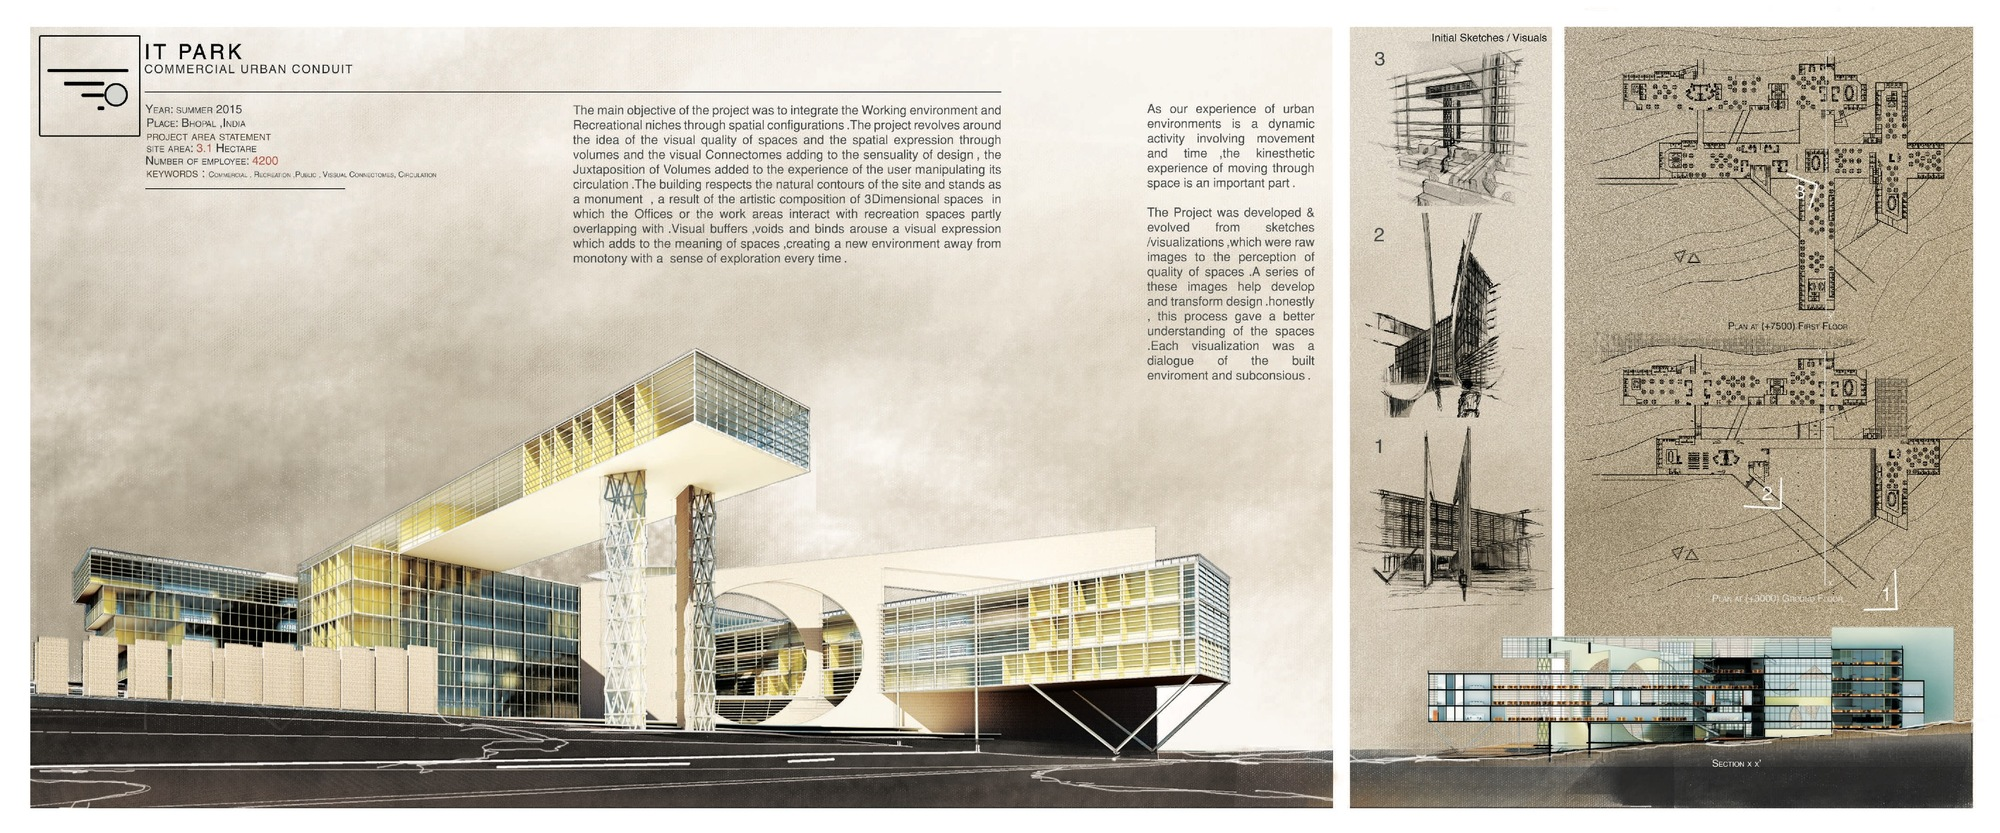 Gallery of the best architecture portfolio designs 2 for Portfolio architektur